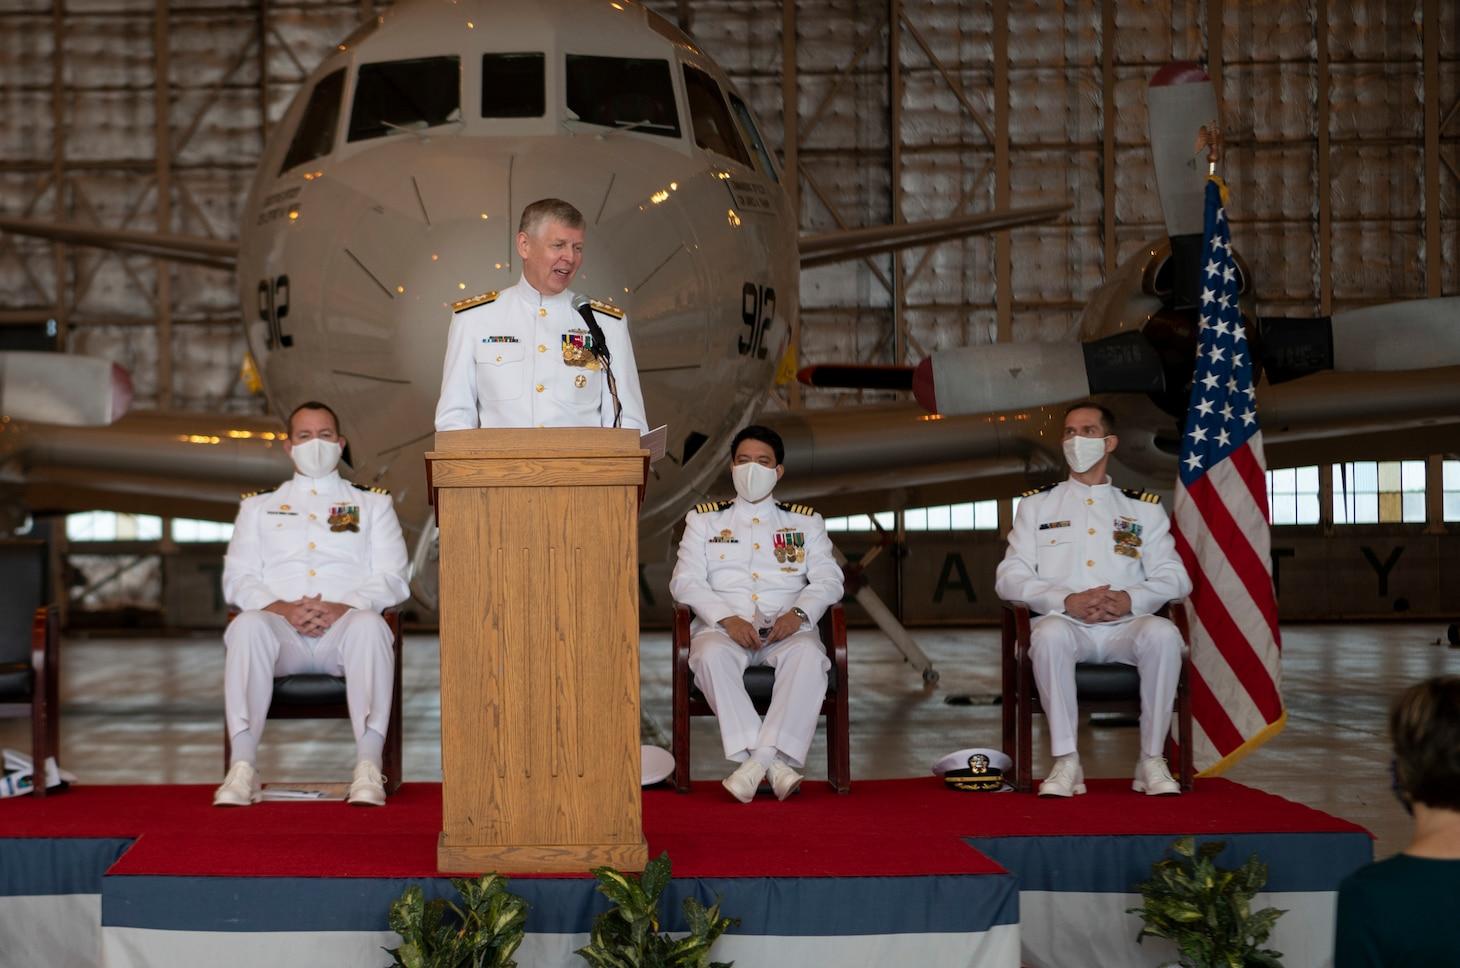 Scientific Development Squadron (VXS) 1 Holds Change of Command